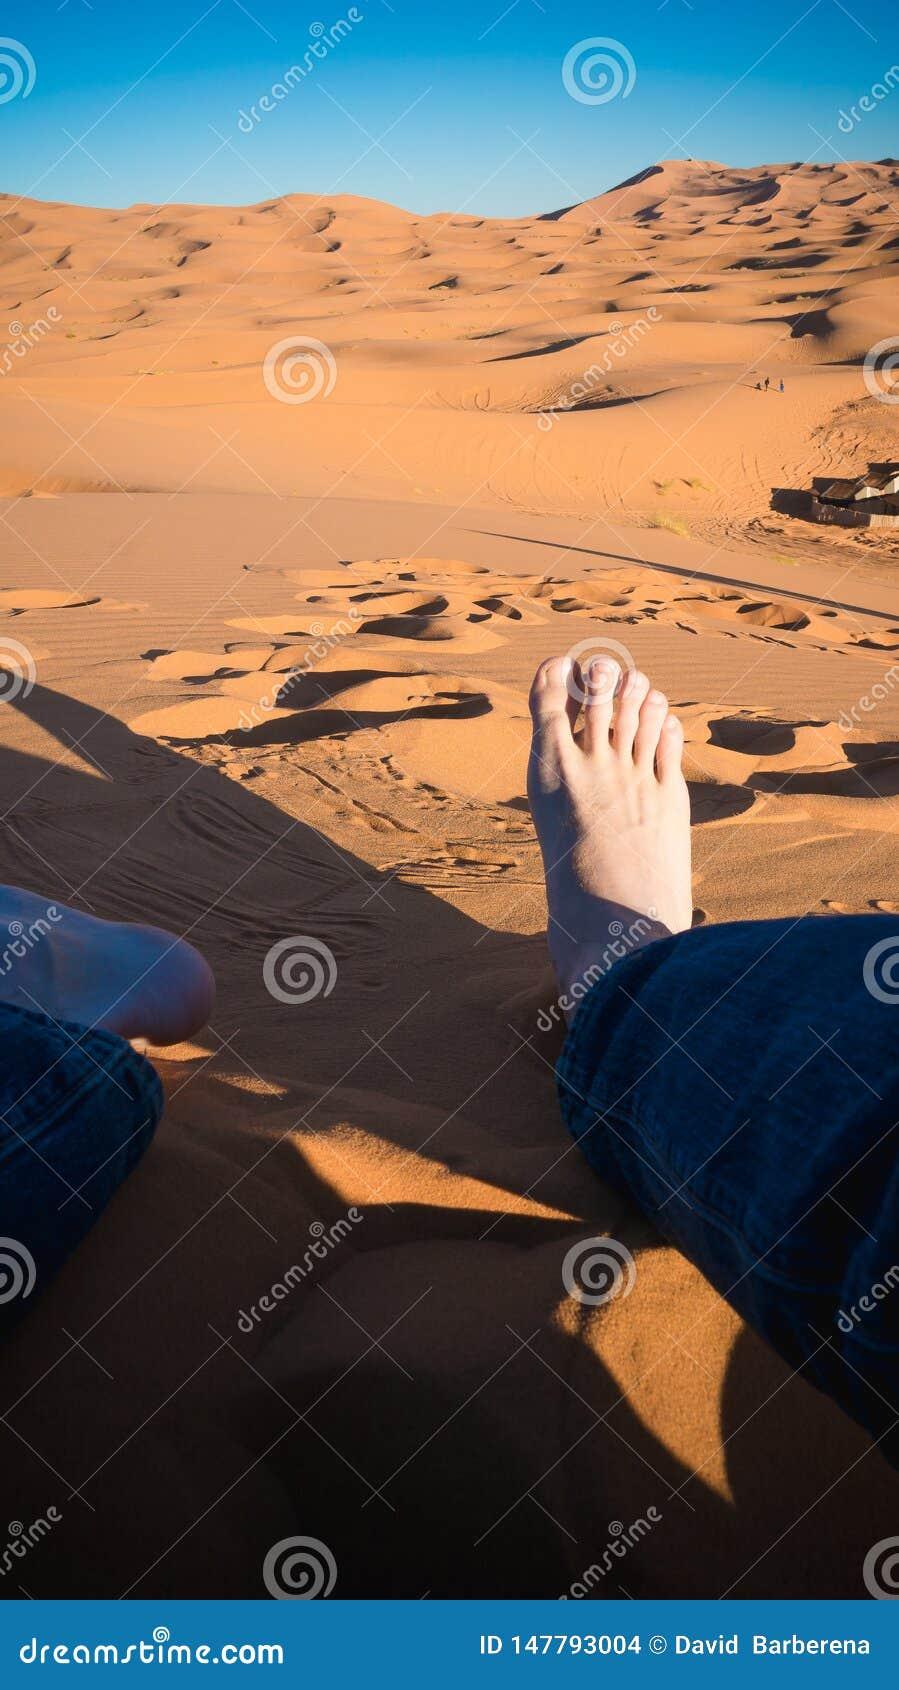 Riposando nel deserto del Sahara